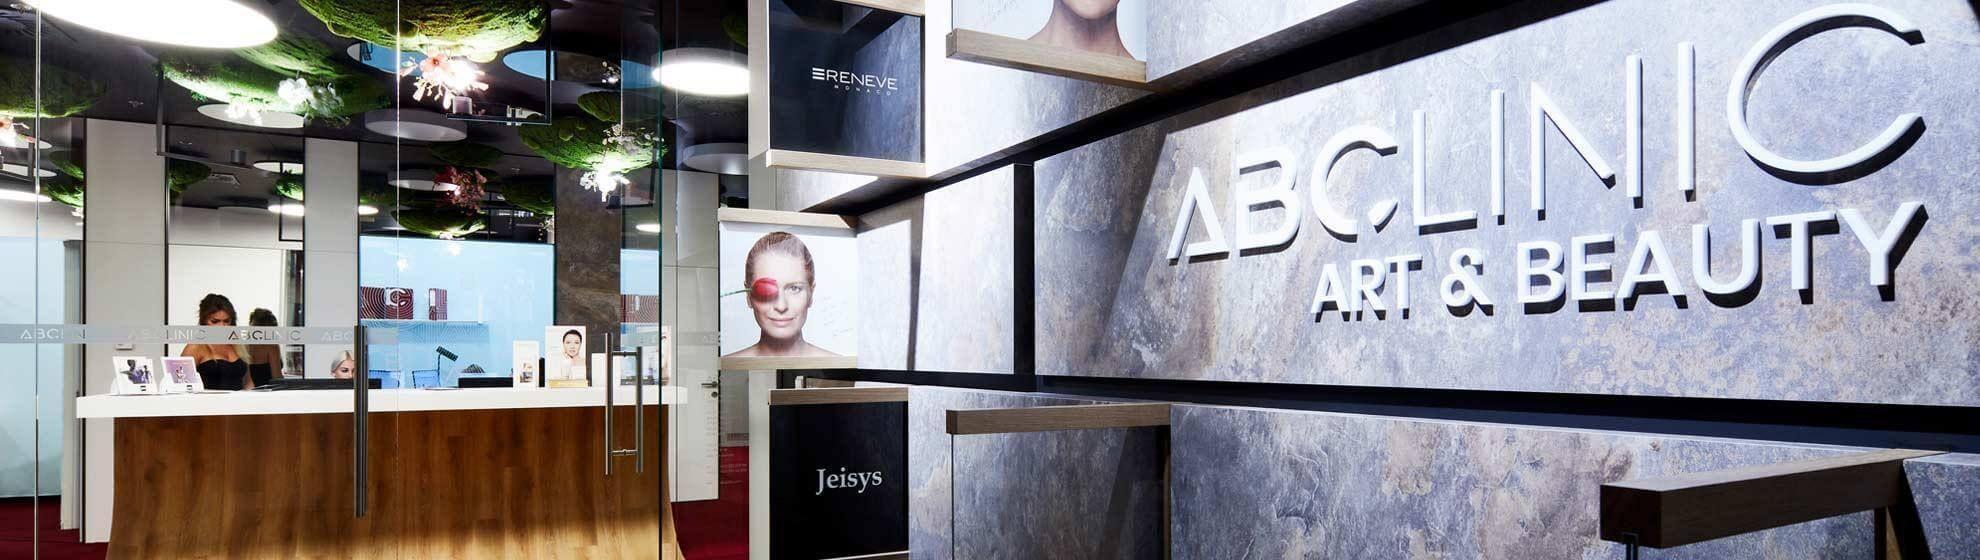 ABClinic Art & Beauty